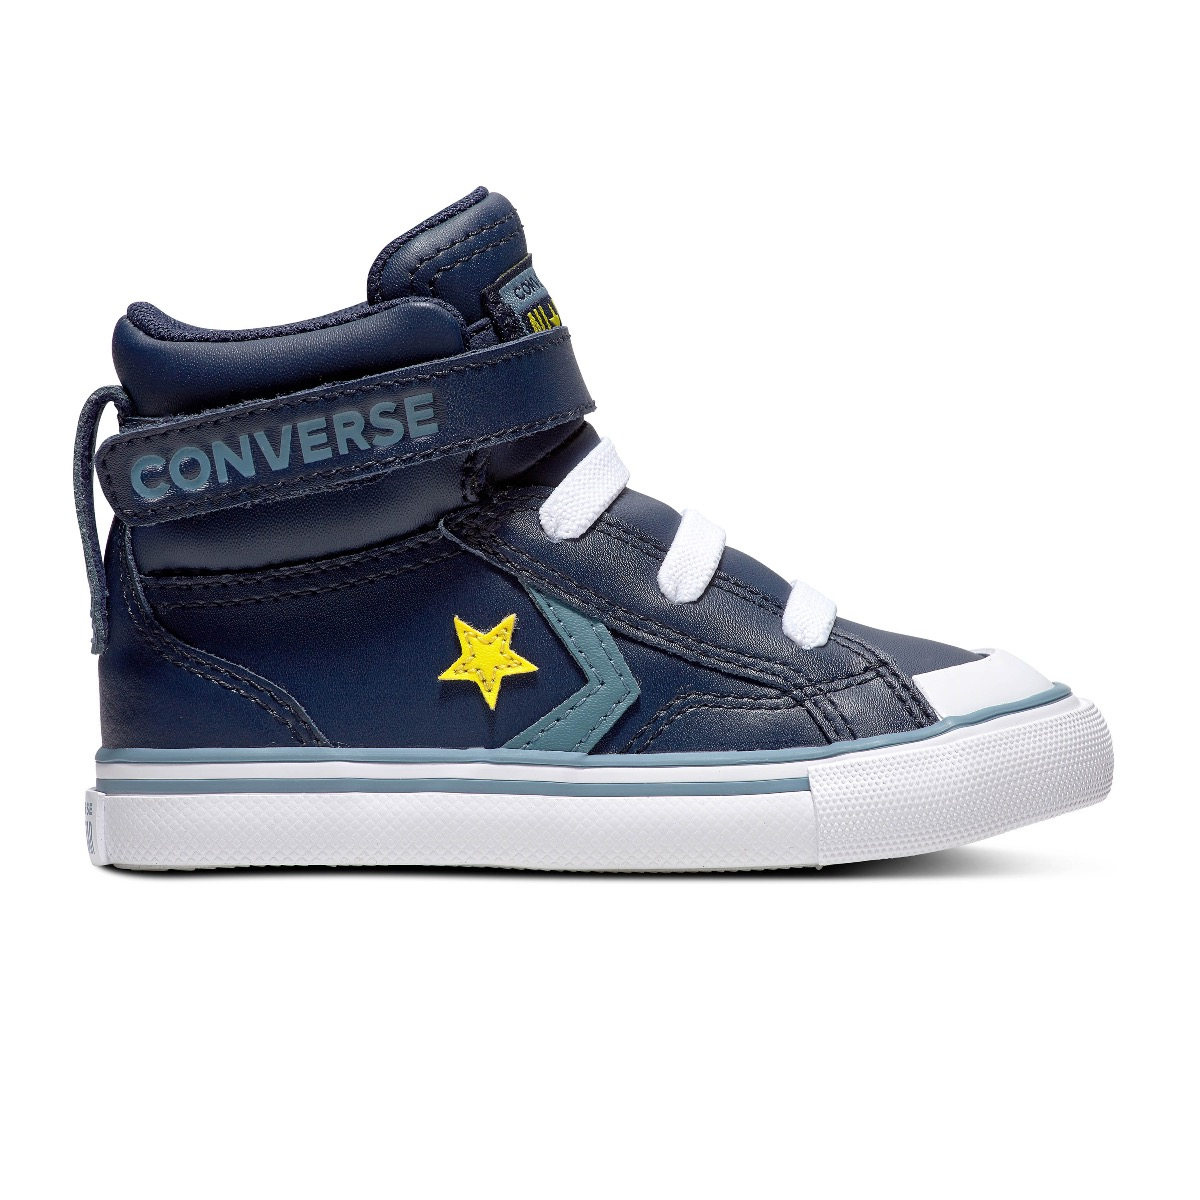 Converse All Stars Pro Blaze Strap 763531C Blauw